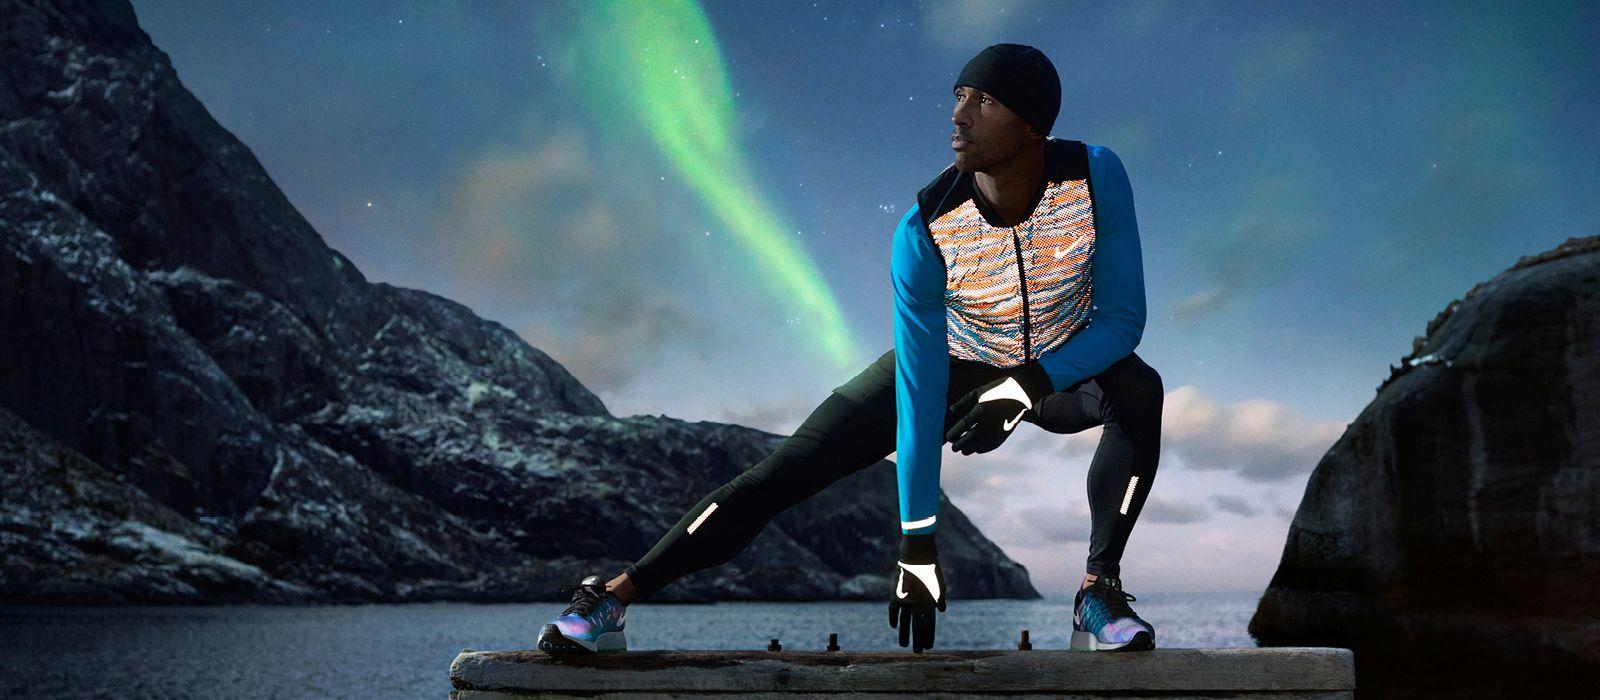 8 Tips to Buying Running Apparel | Running on Happy